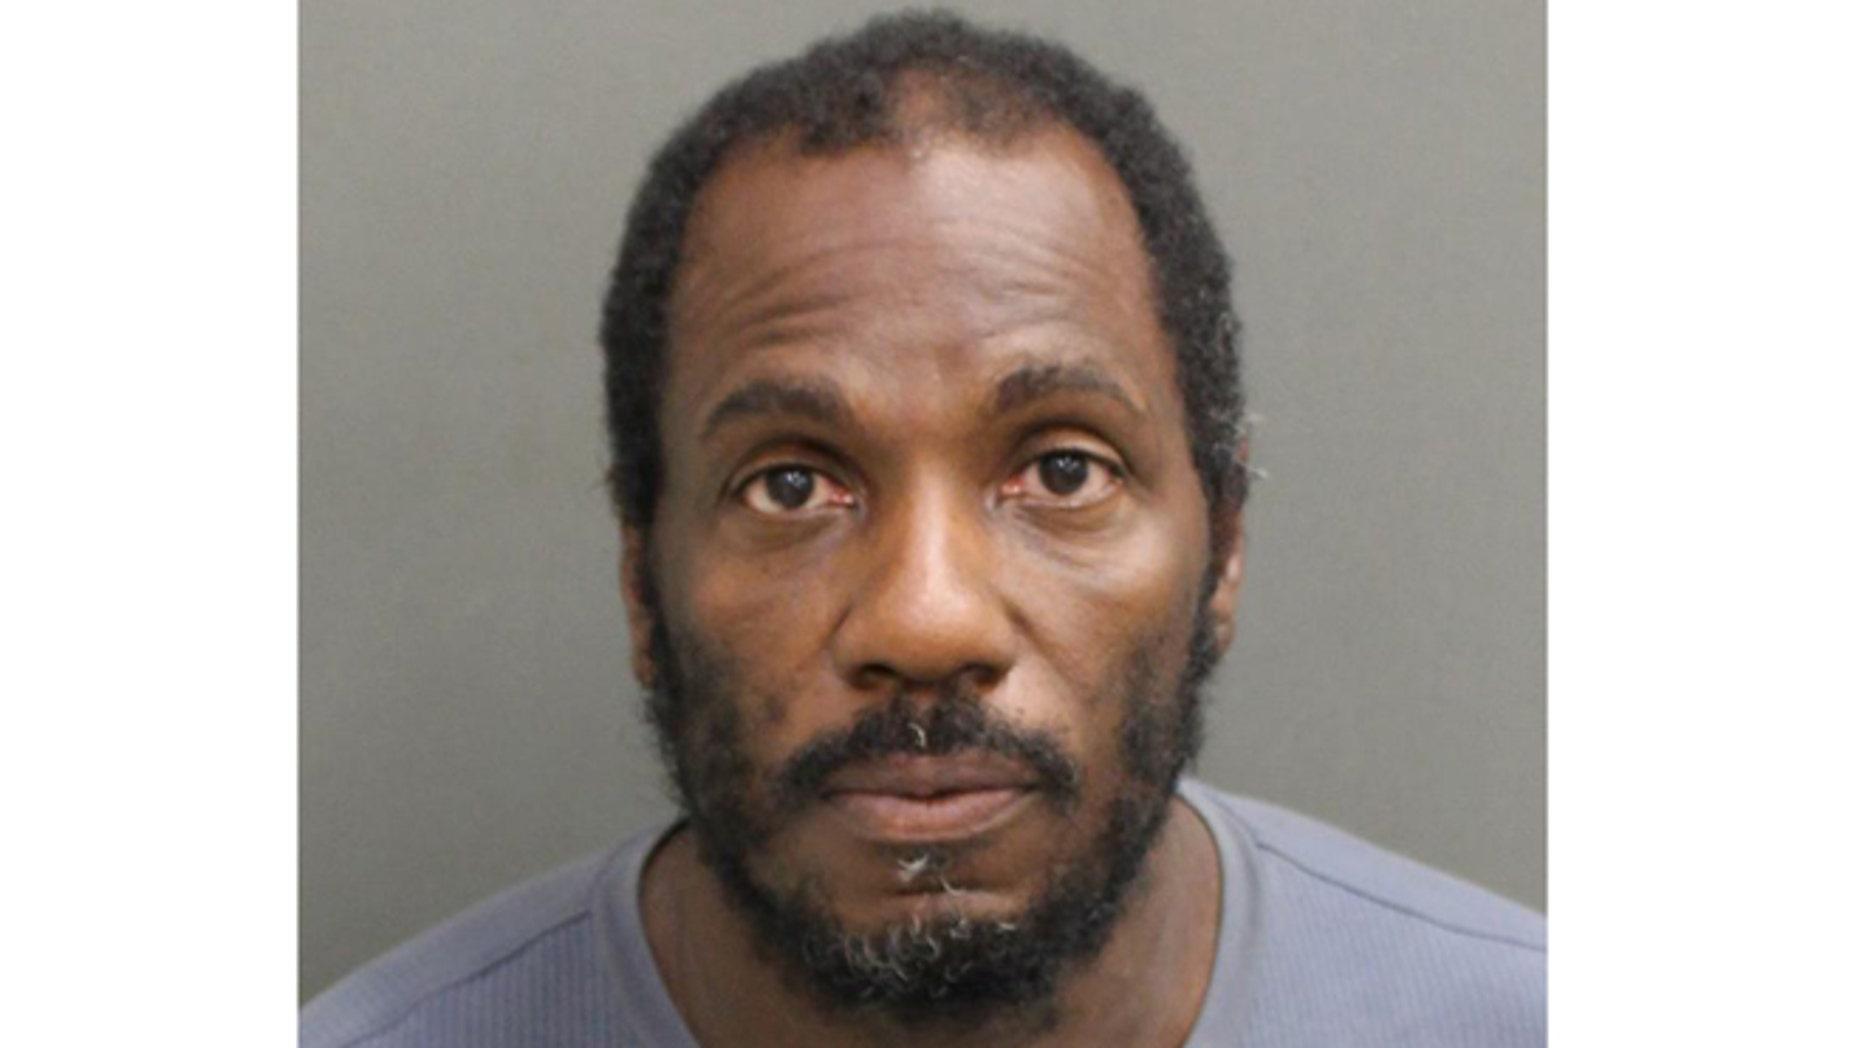 Mugshot for Lonnie Leonard, 51, of Apopka, Florida.